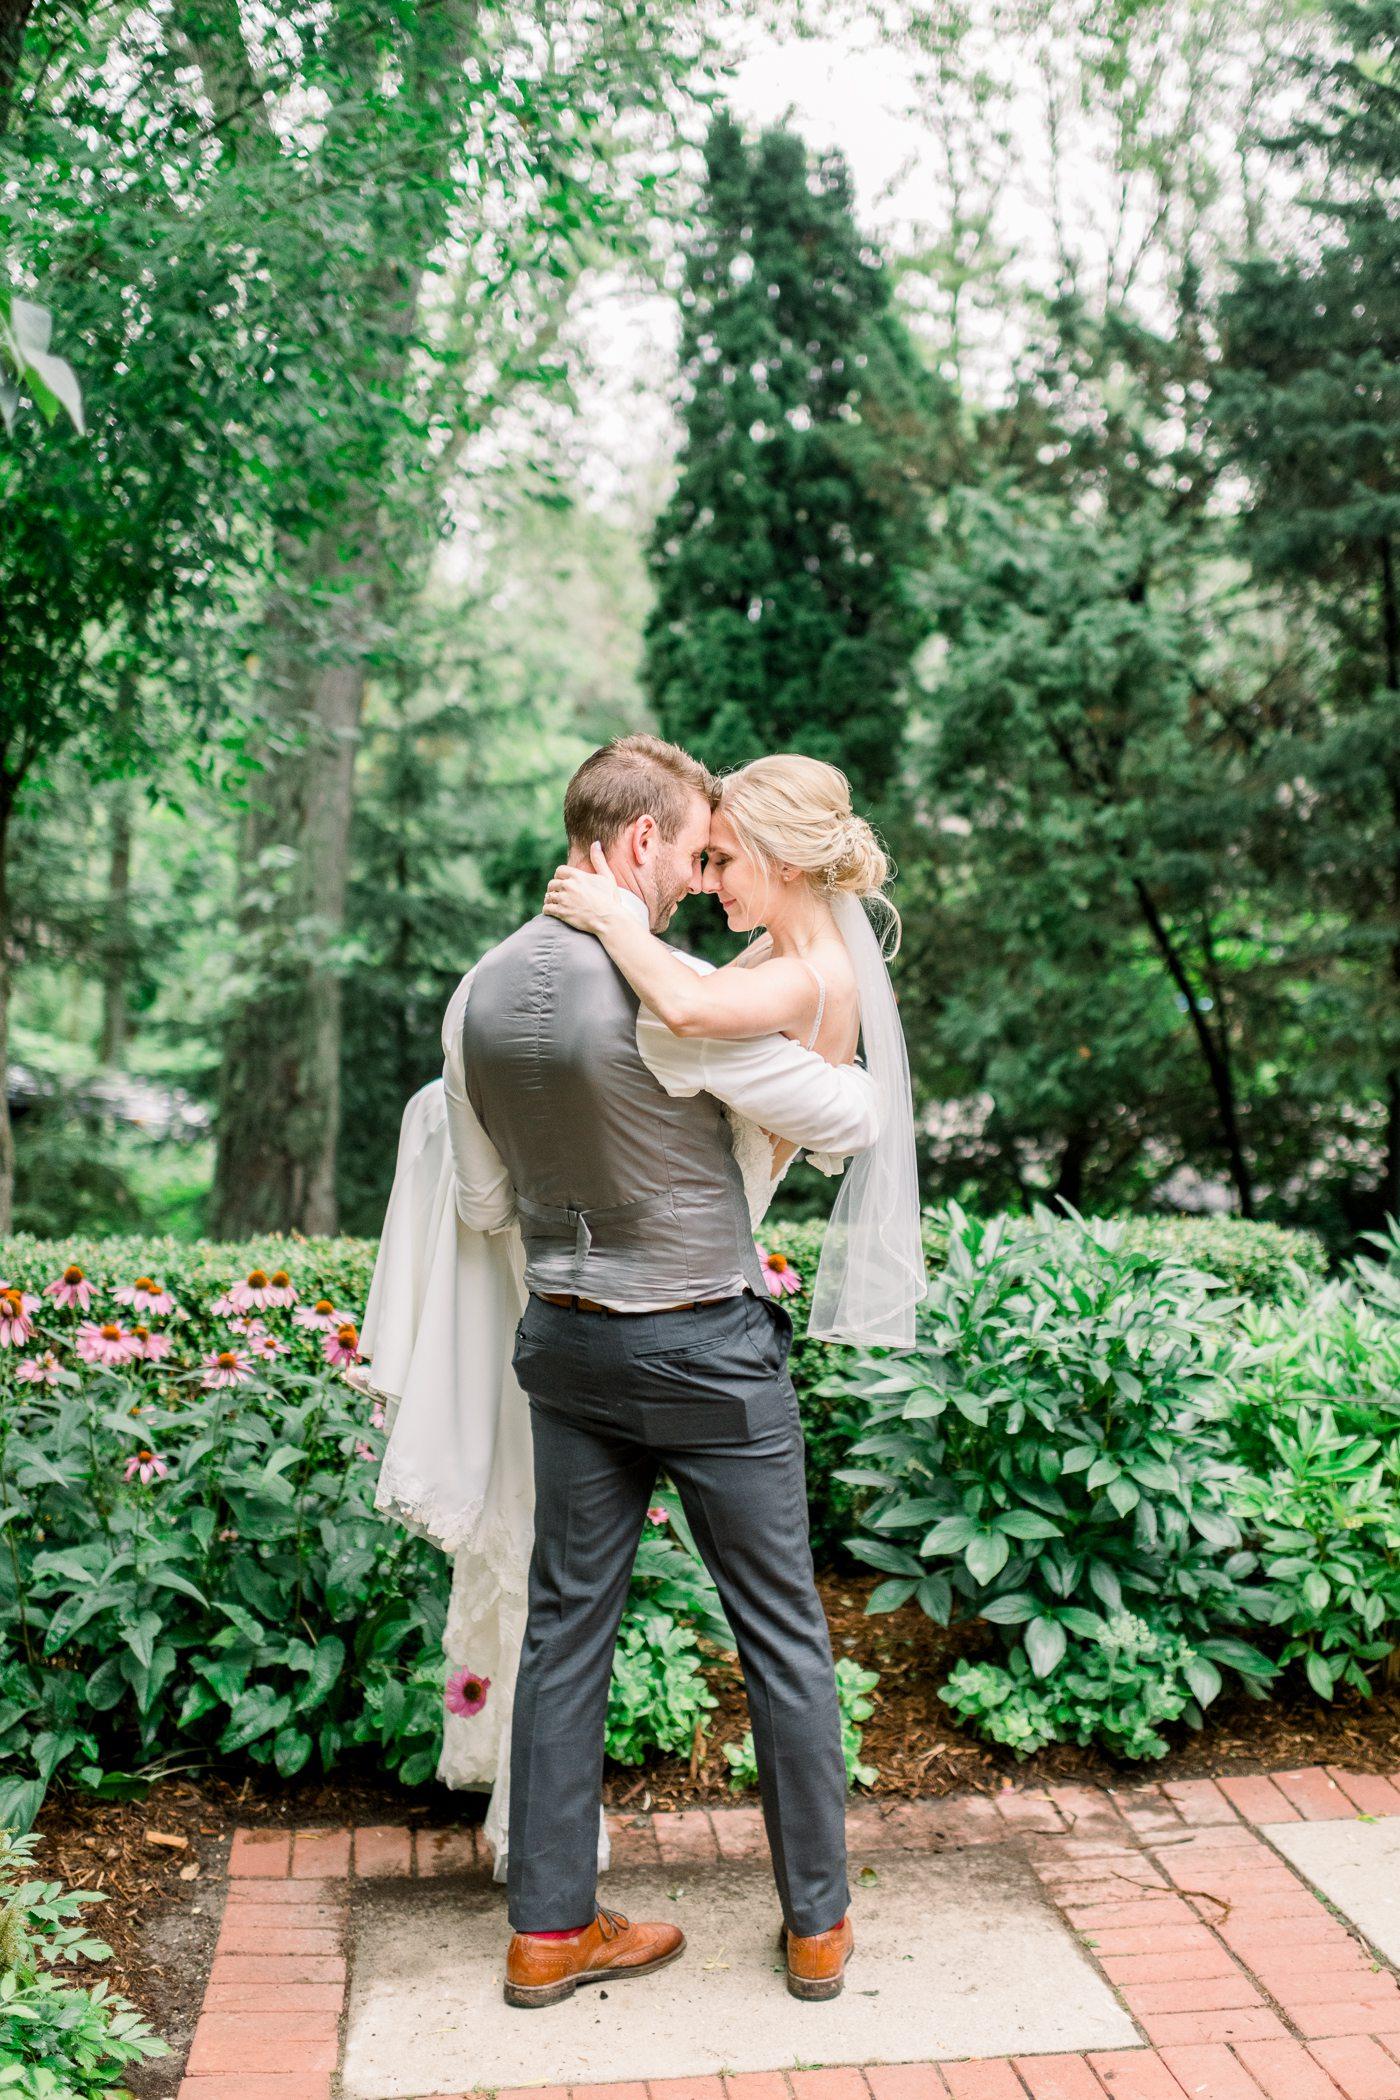 Mequon, WI Wedding Photographers - Larissa Marie Photography